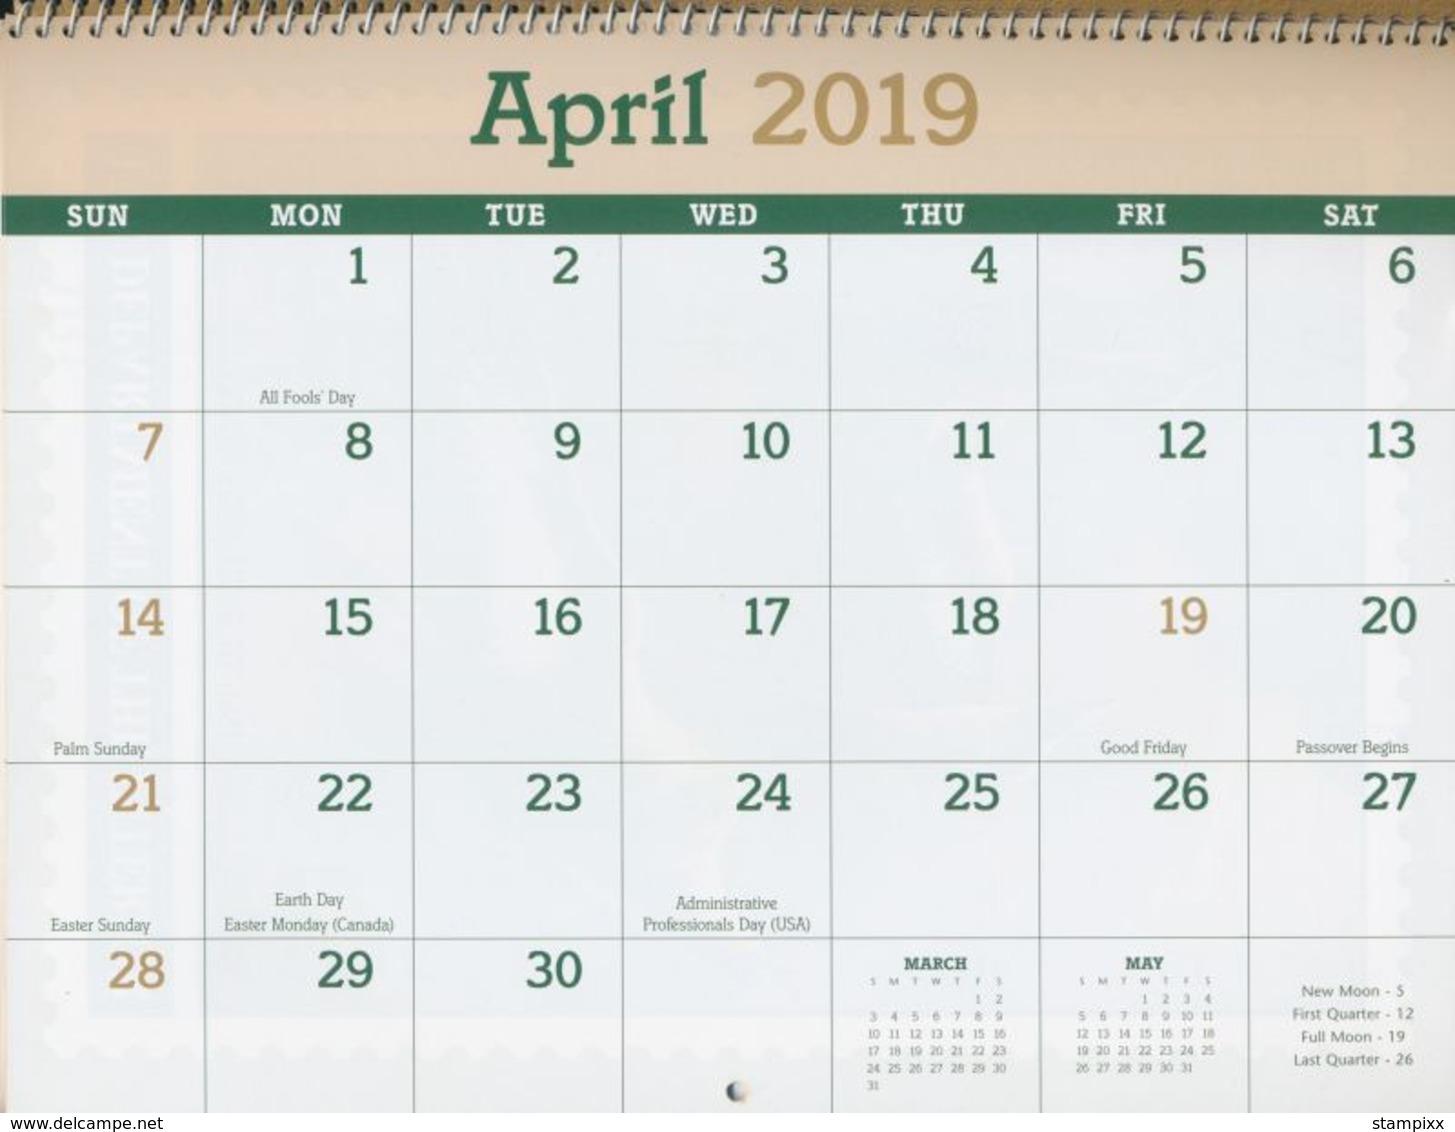 USA Calendar Ducks. Migratory Birds And Hunting Conservation Stamp 2019 - Seizoenen En Feesten